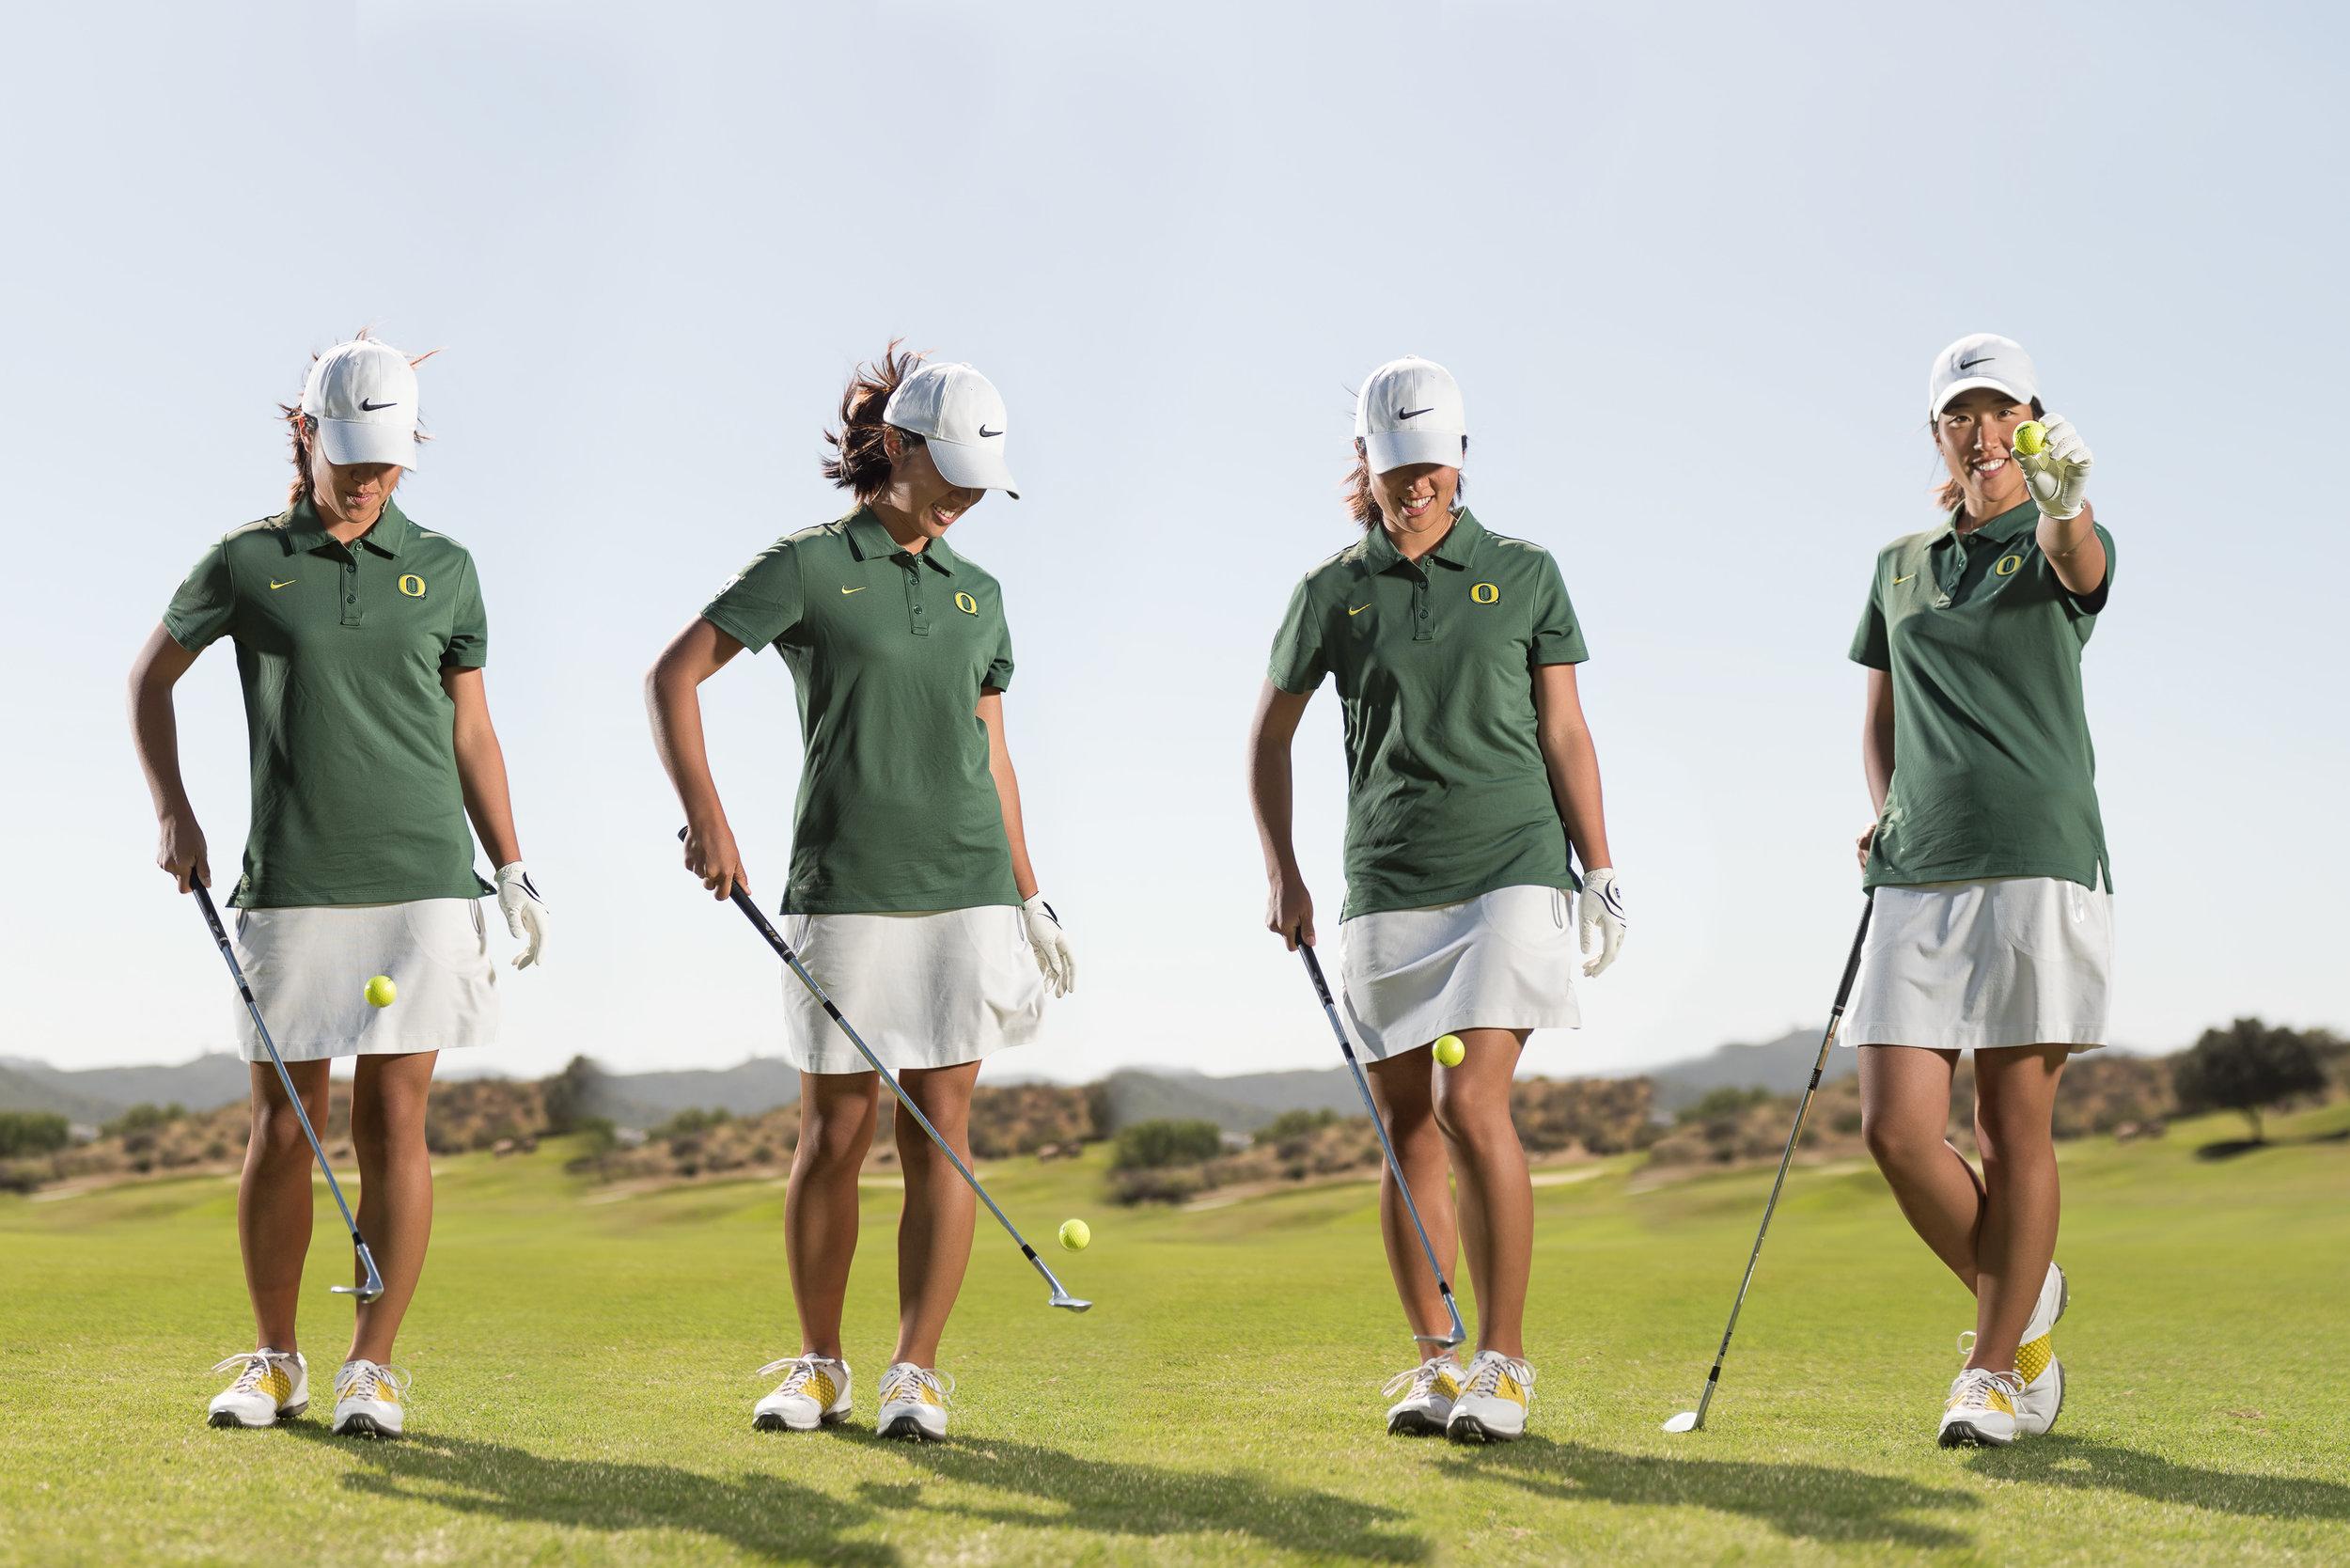 Hanule Sky Seo | Professional Golfer